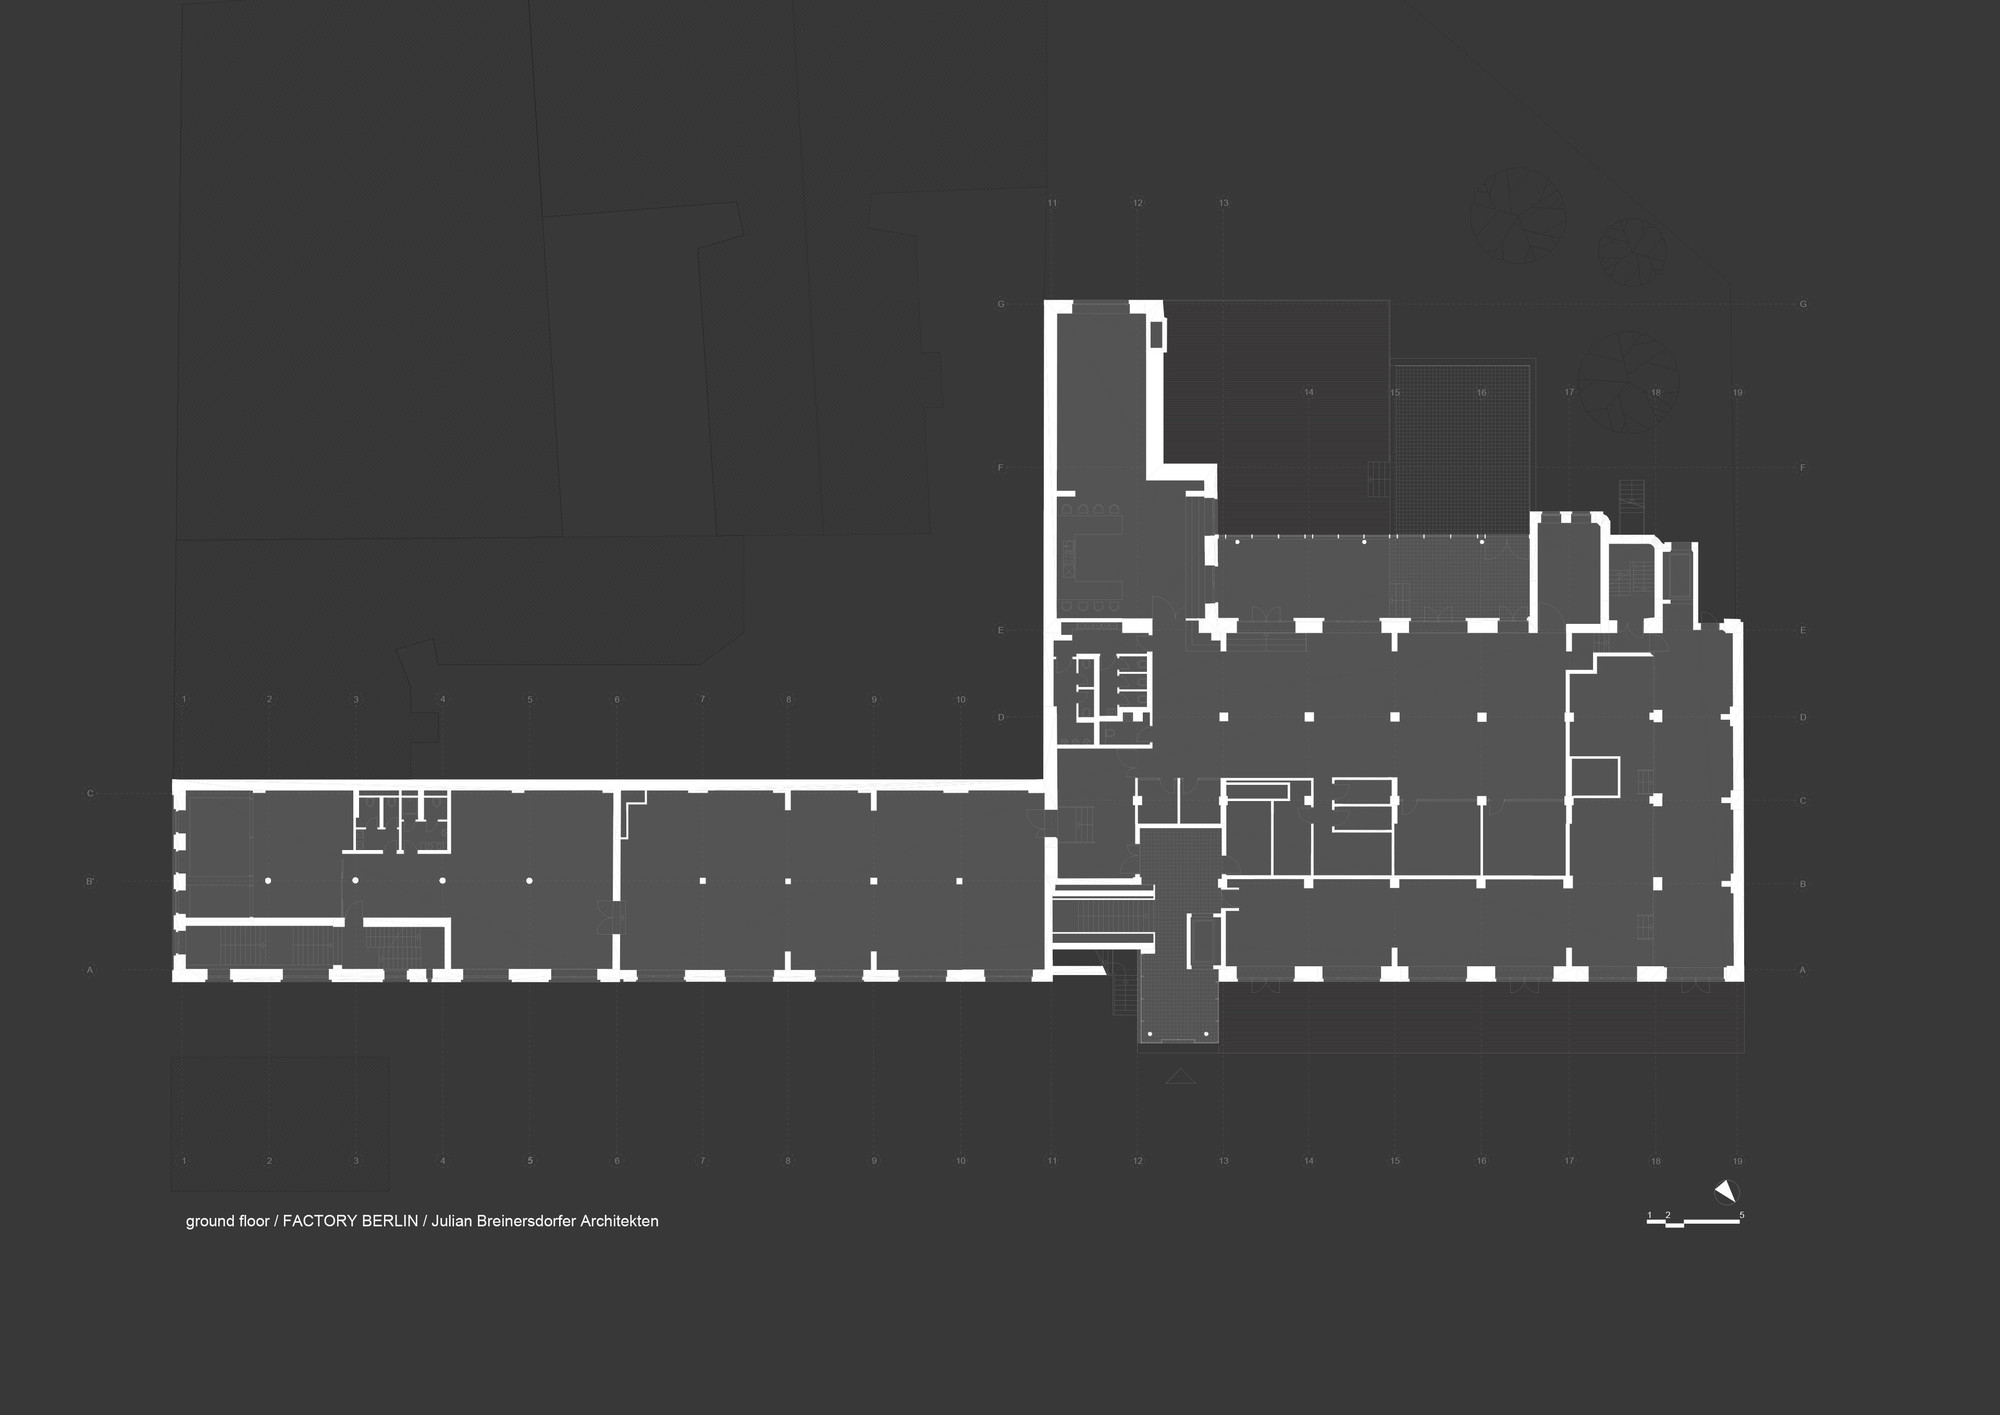 Gallery Of The Factory Berlin Julian Breinersdorfer